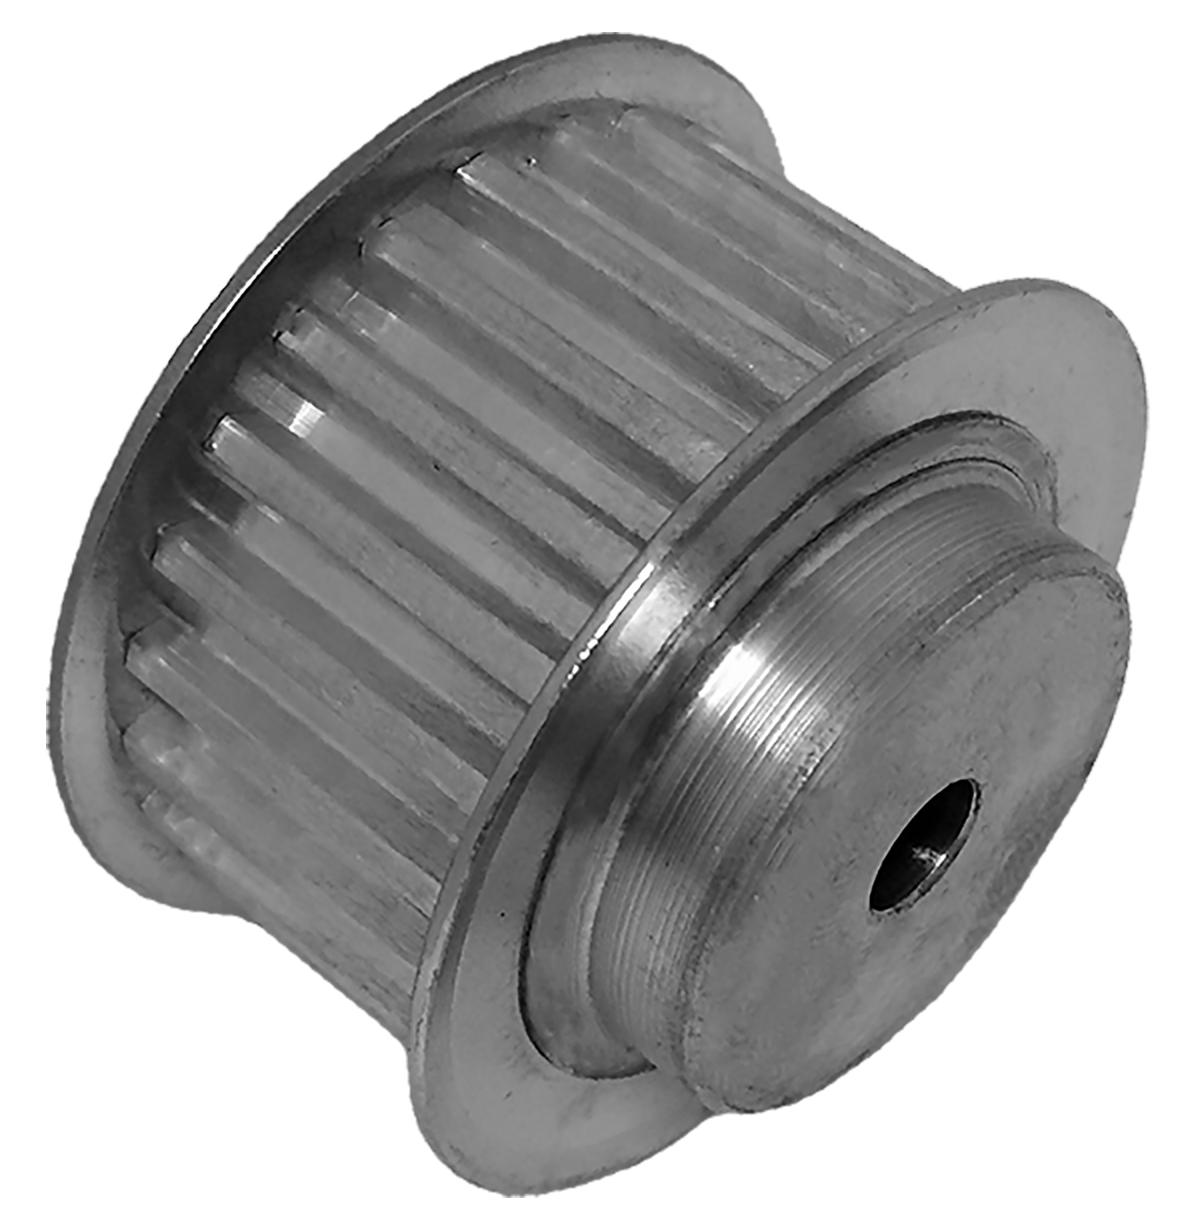 27T5/24-2 - Aluminum Metric Pulleys